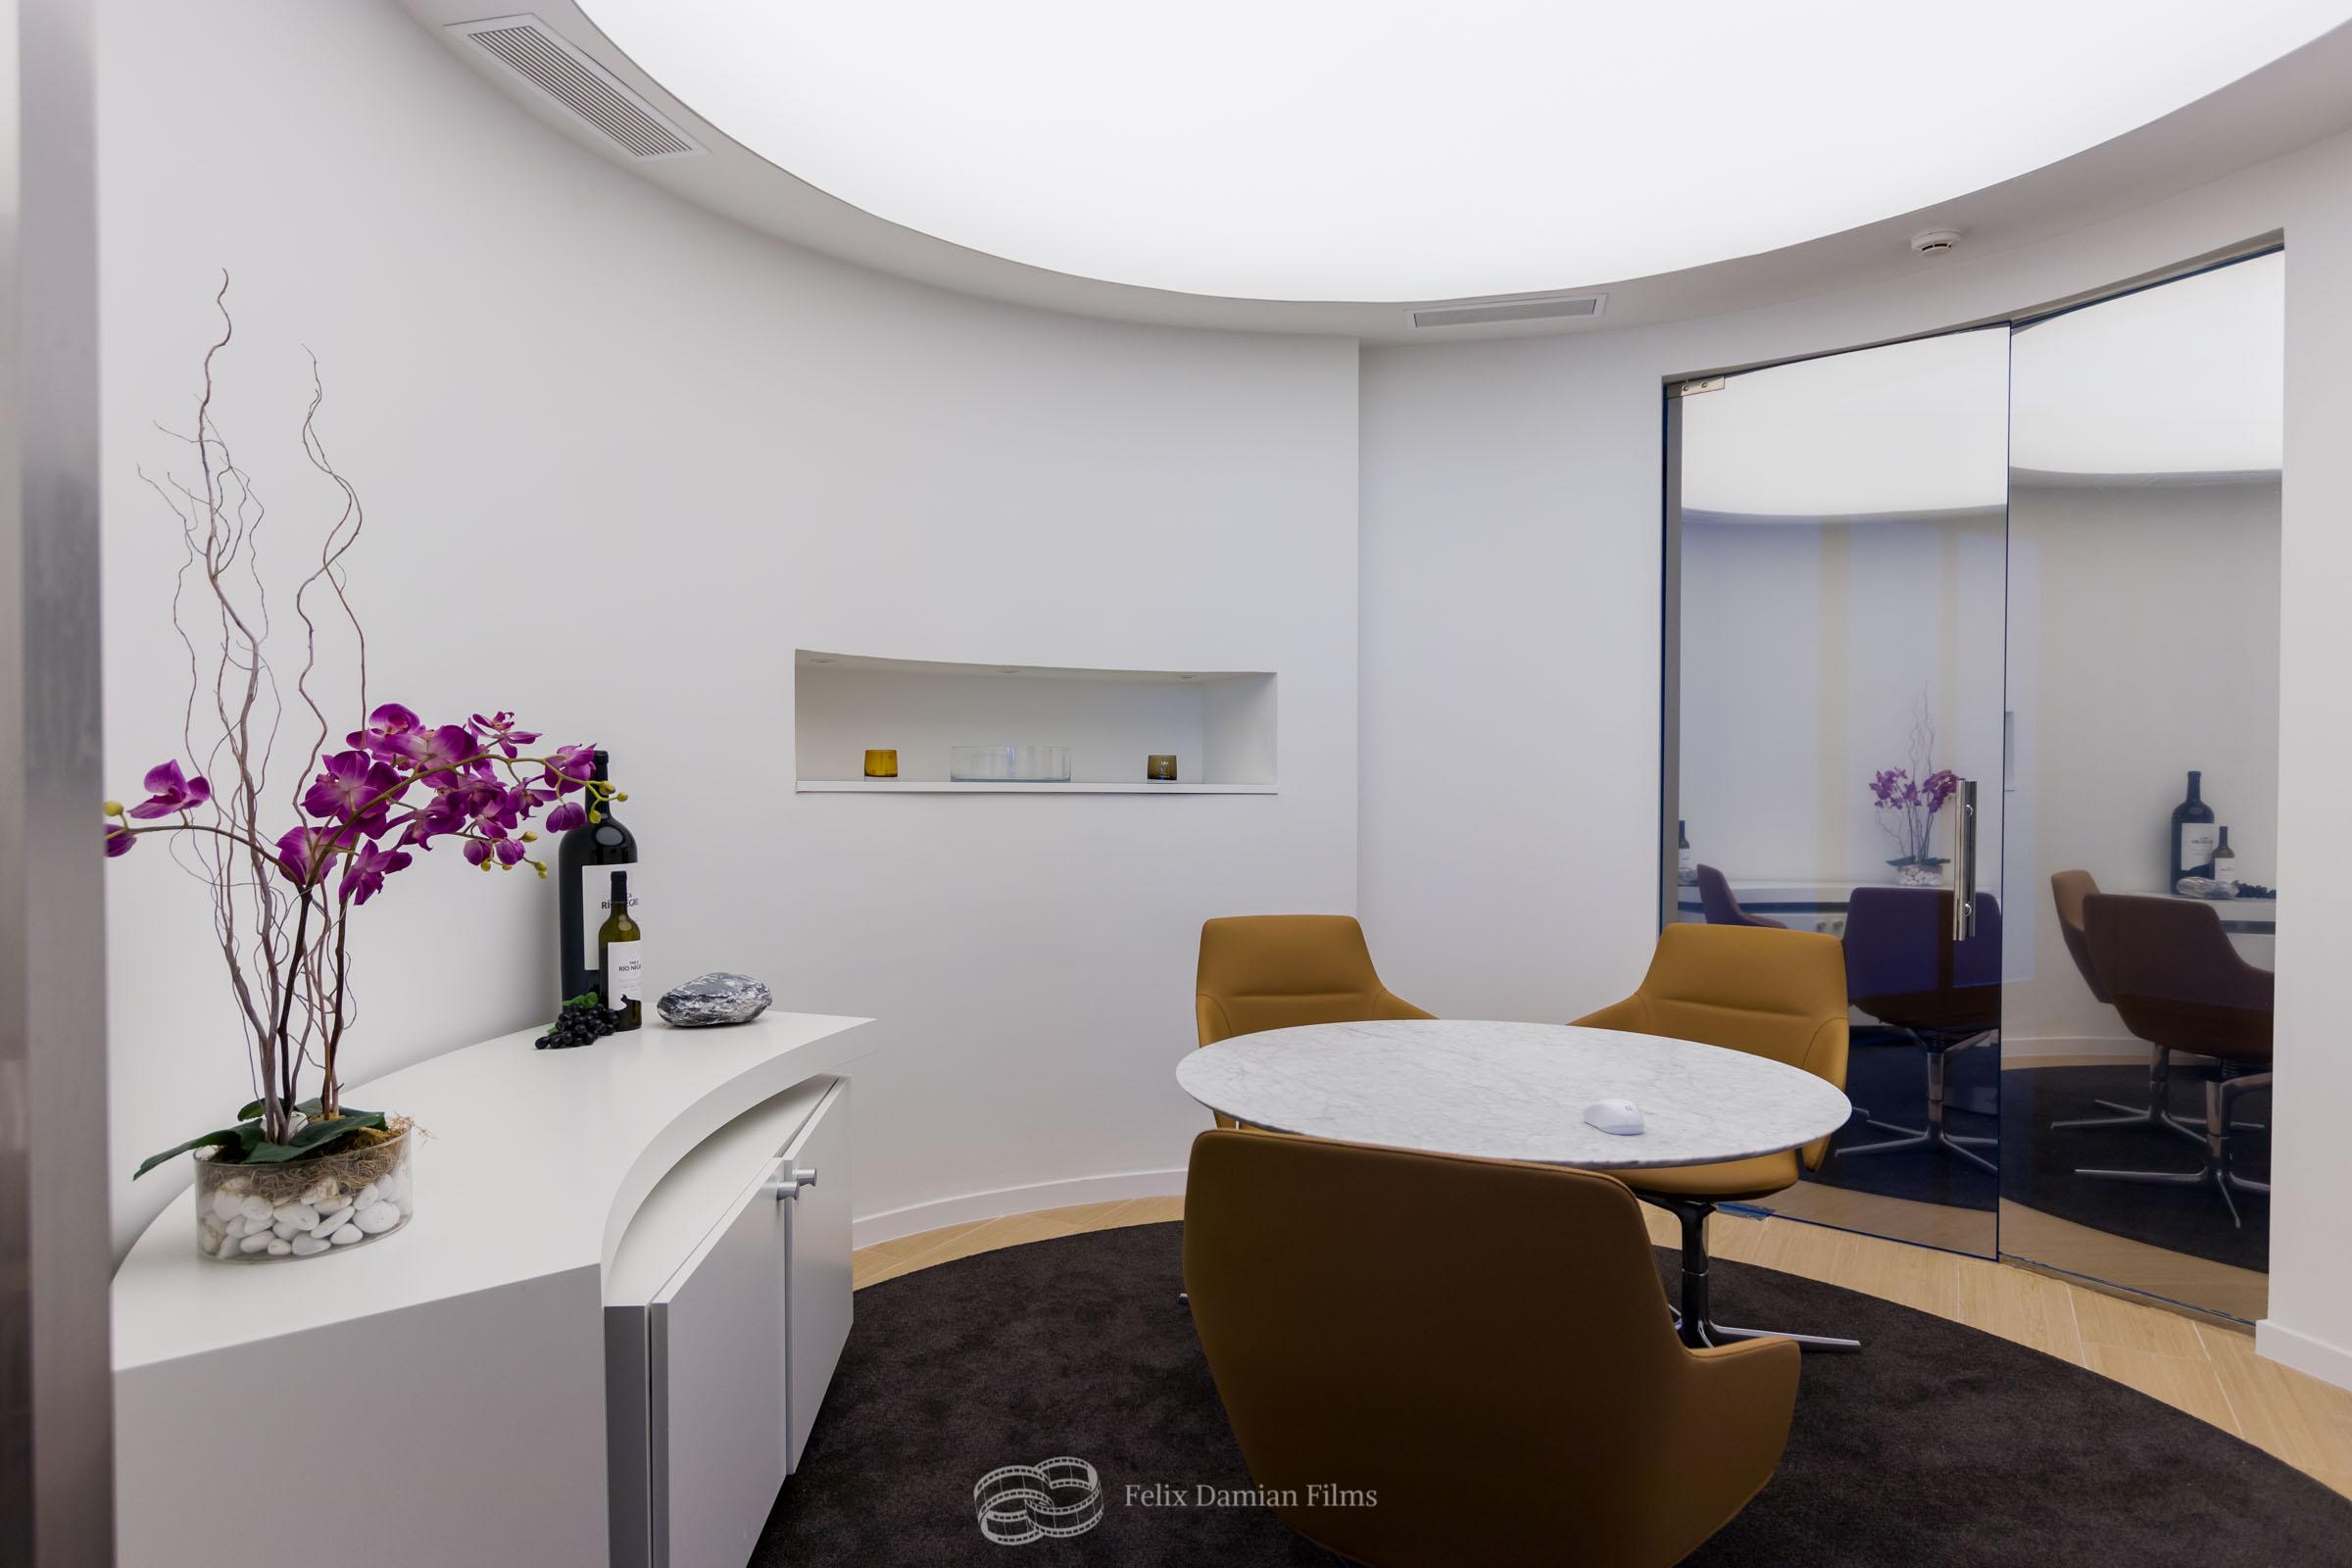 fotografia de interiores para negocios